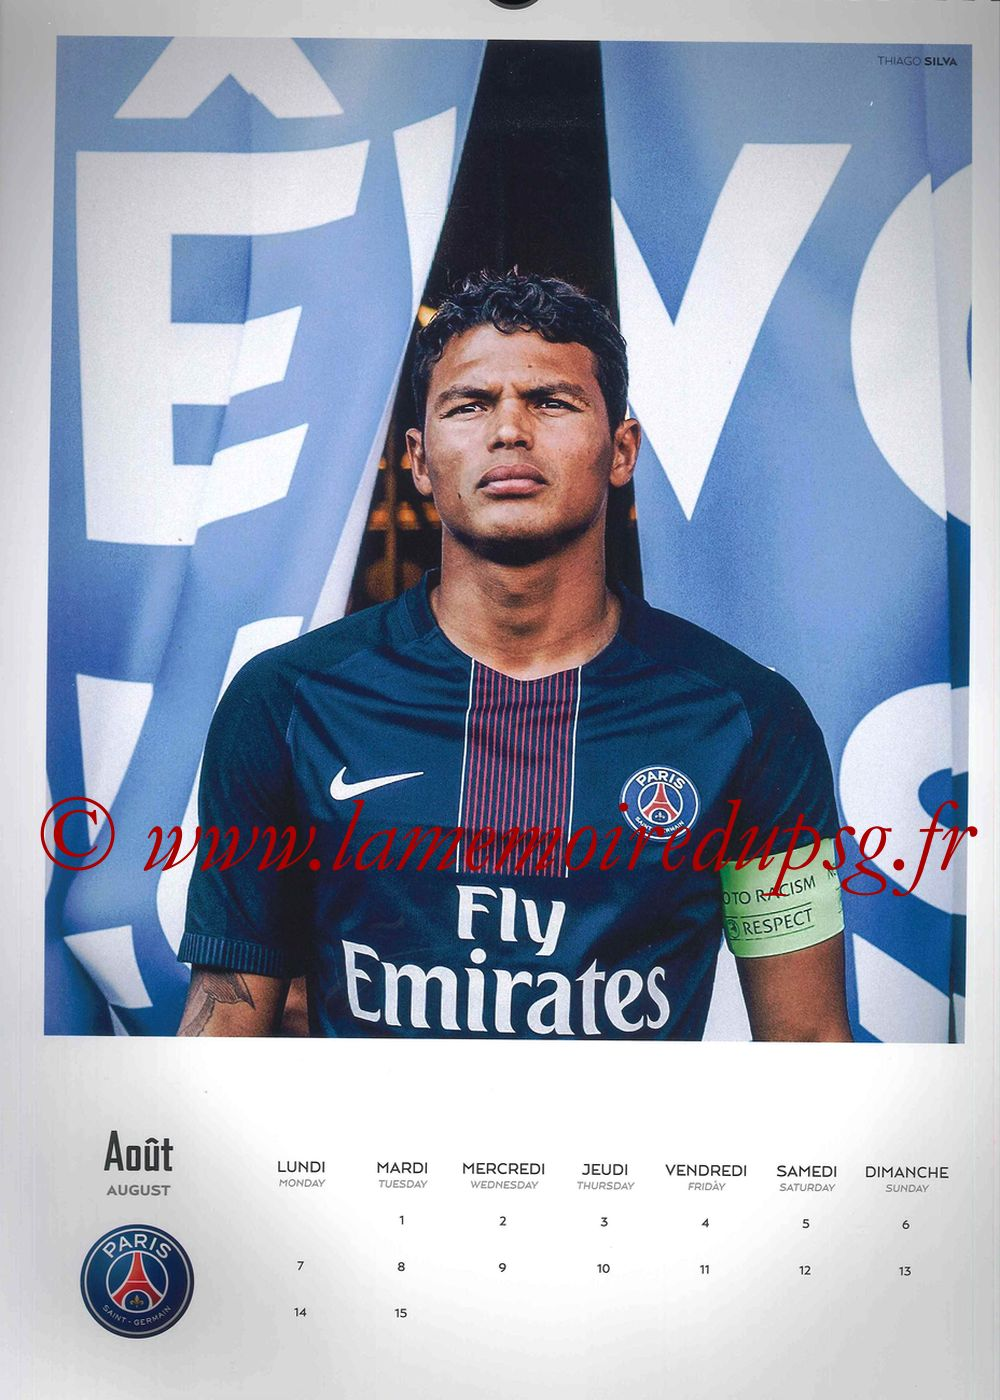 Calendrier PSG 2017 - Page 15 - Thiago SILVA